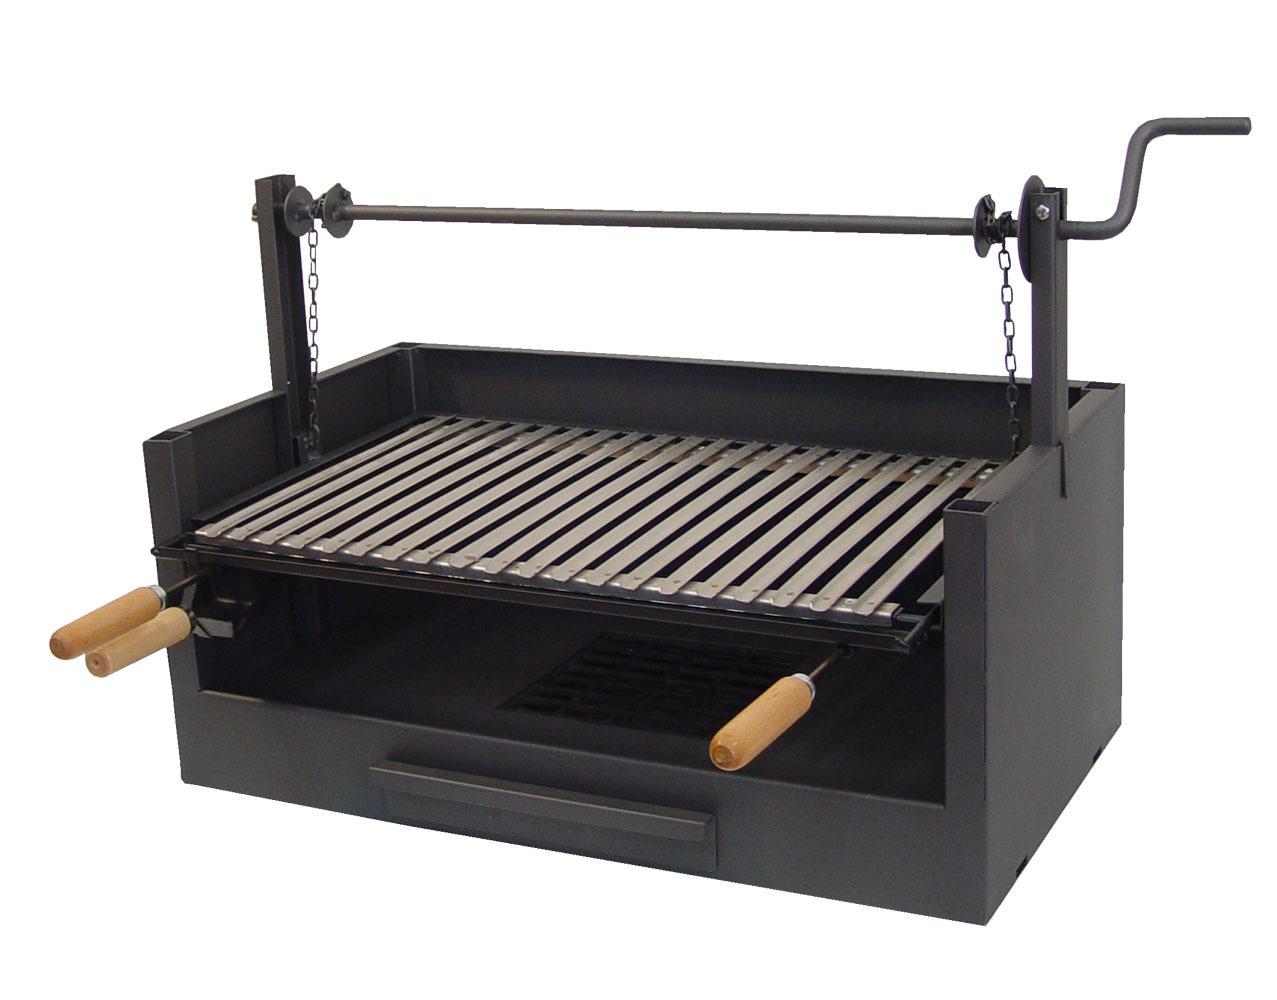 cajon barbacoa merida the barbecue store. Black Bedroom Furniture Sets. Home Design Ideas